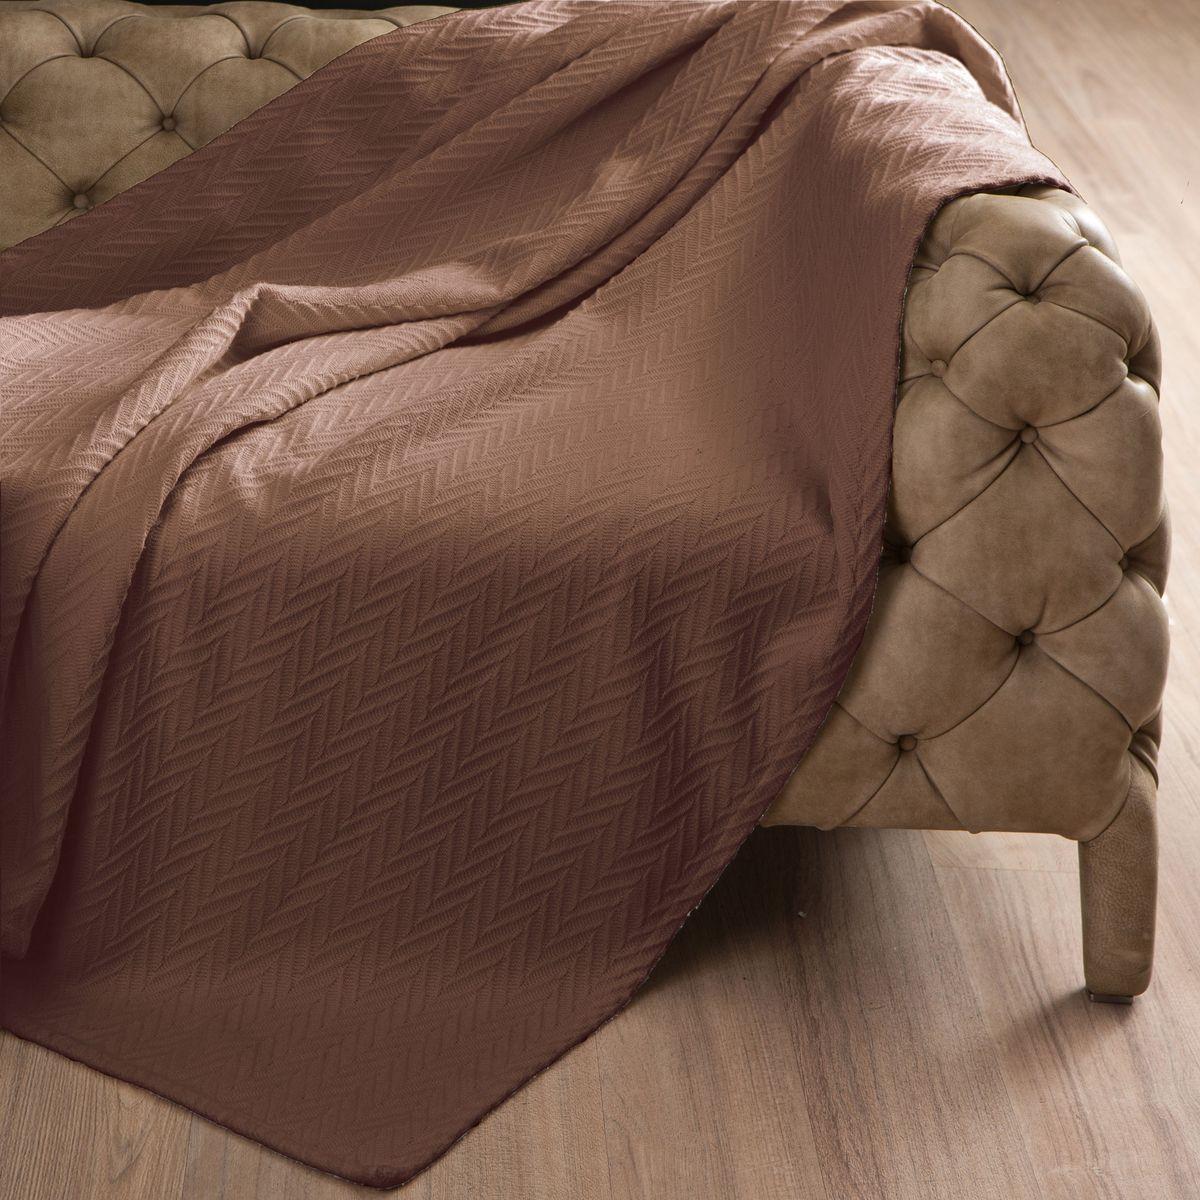 Покрывало Arloni Энджел, цвет: какао, 220 х 240 см скатерть arloni arloni mp002xu0du48